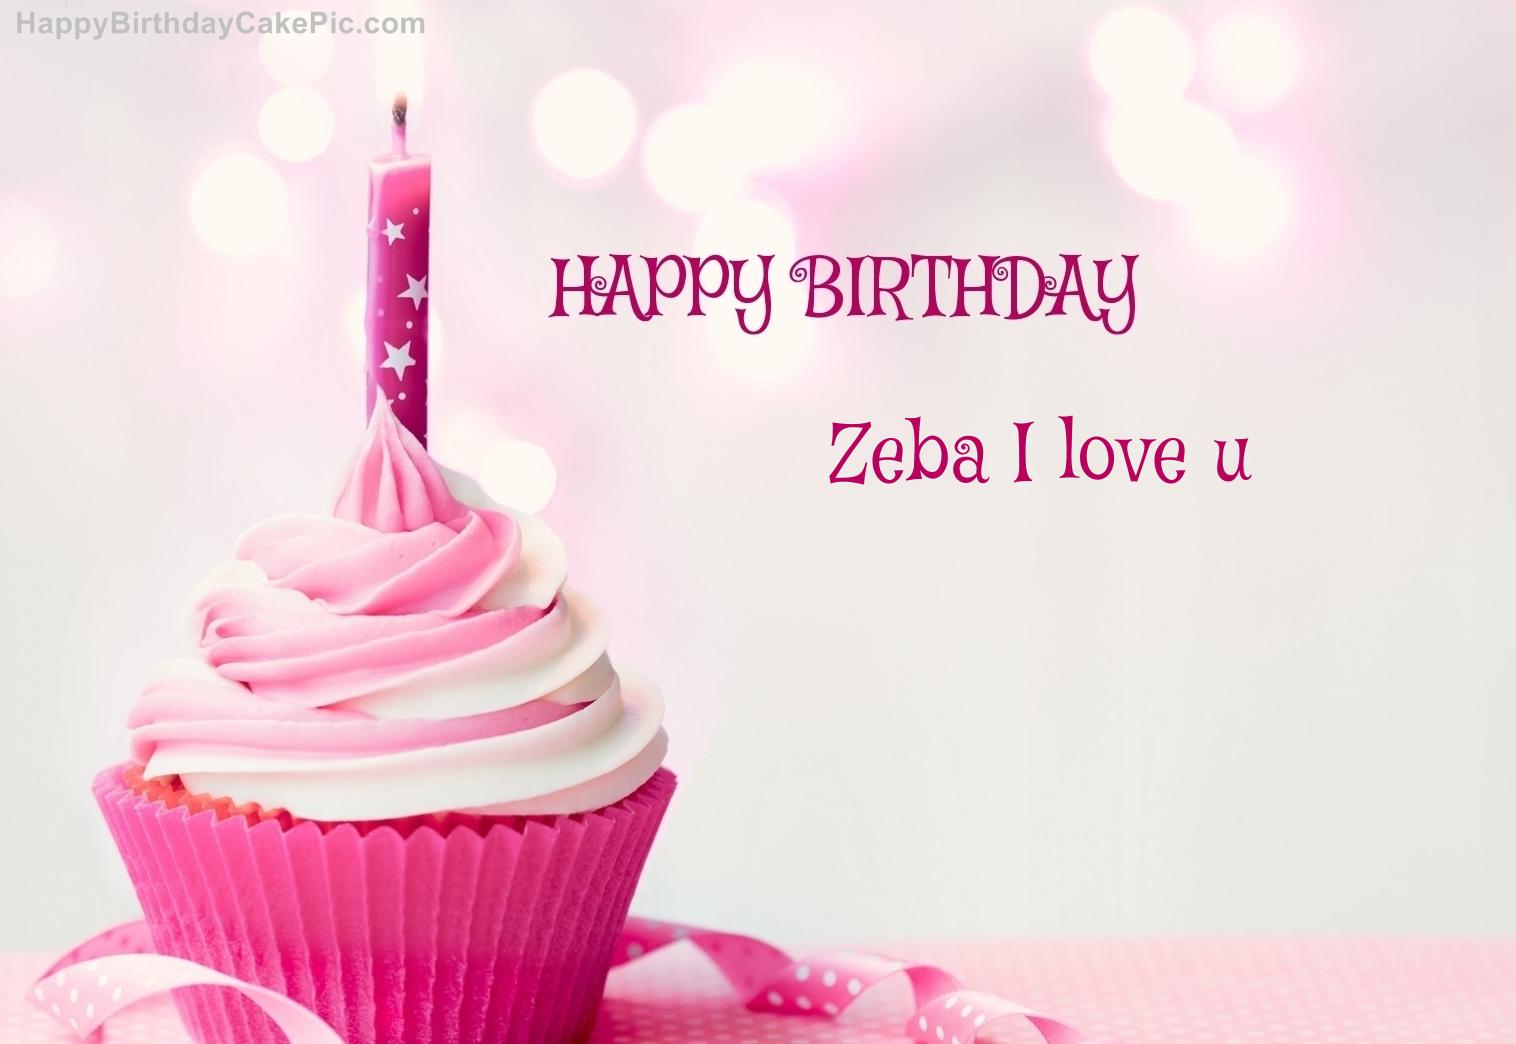 ❤️ happy birthday cupcake candle pink cake for zeba i love u